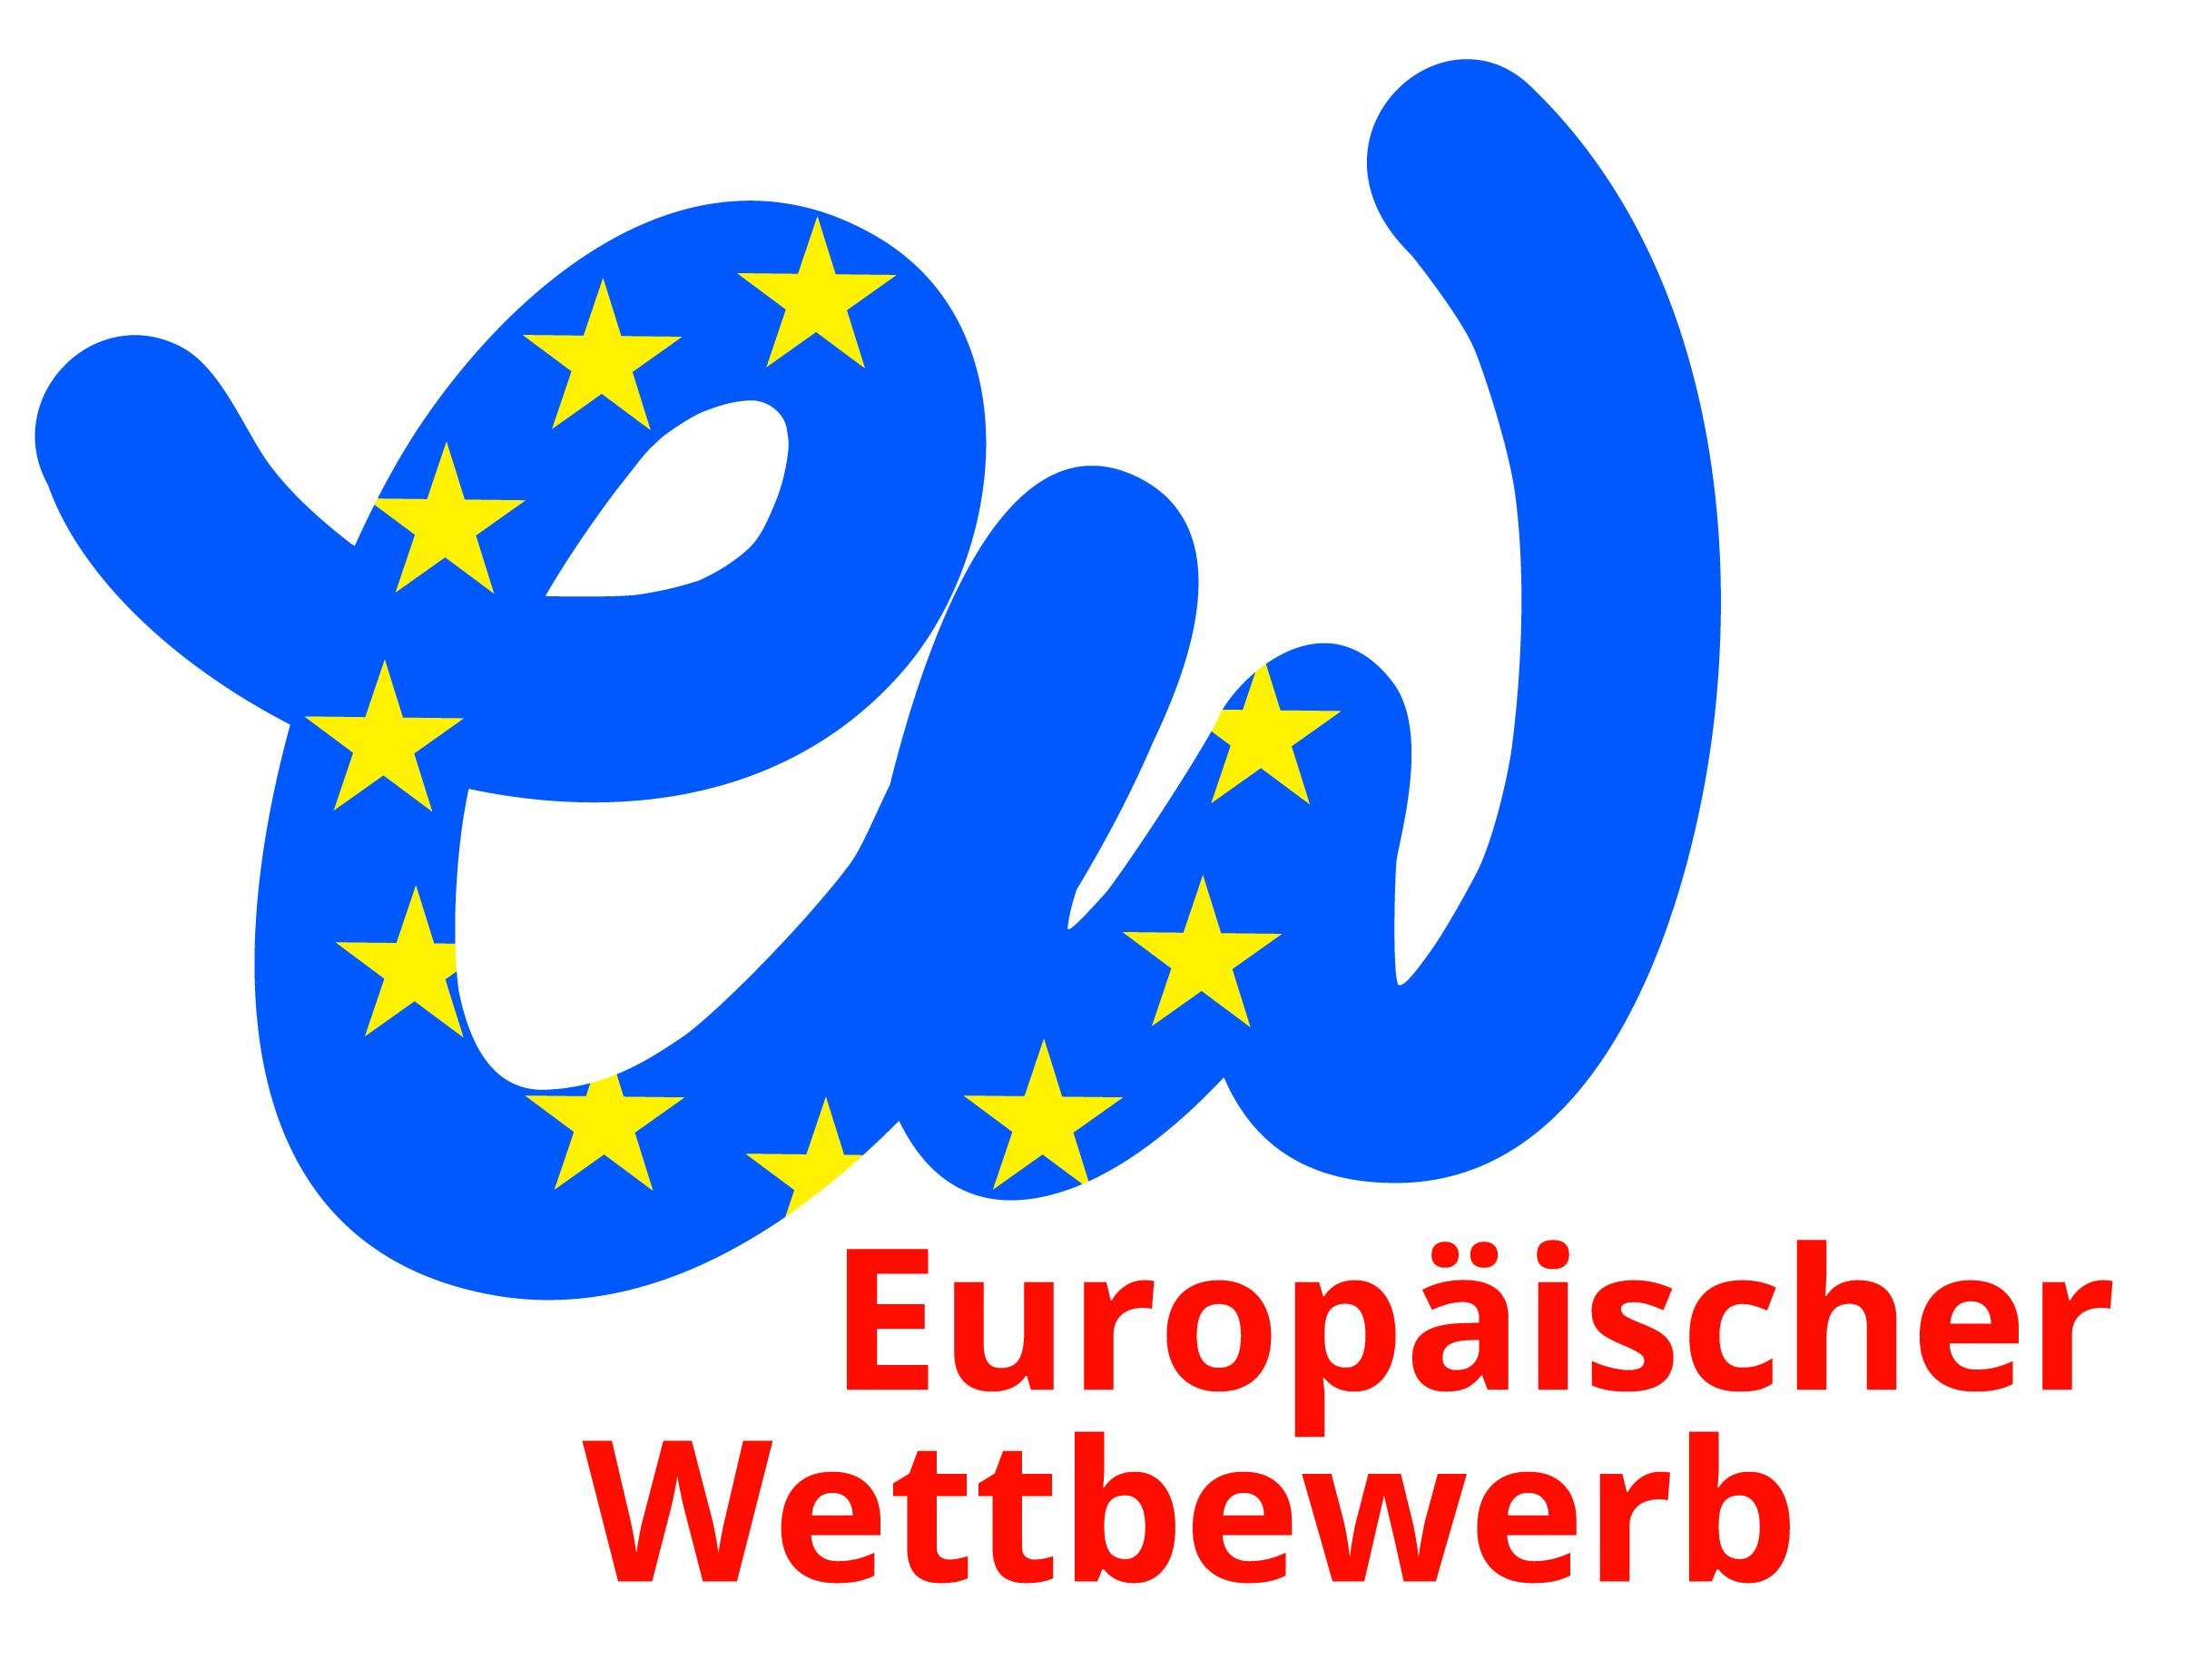 EU Wettbewerb